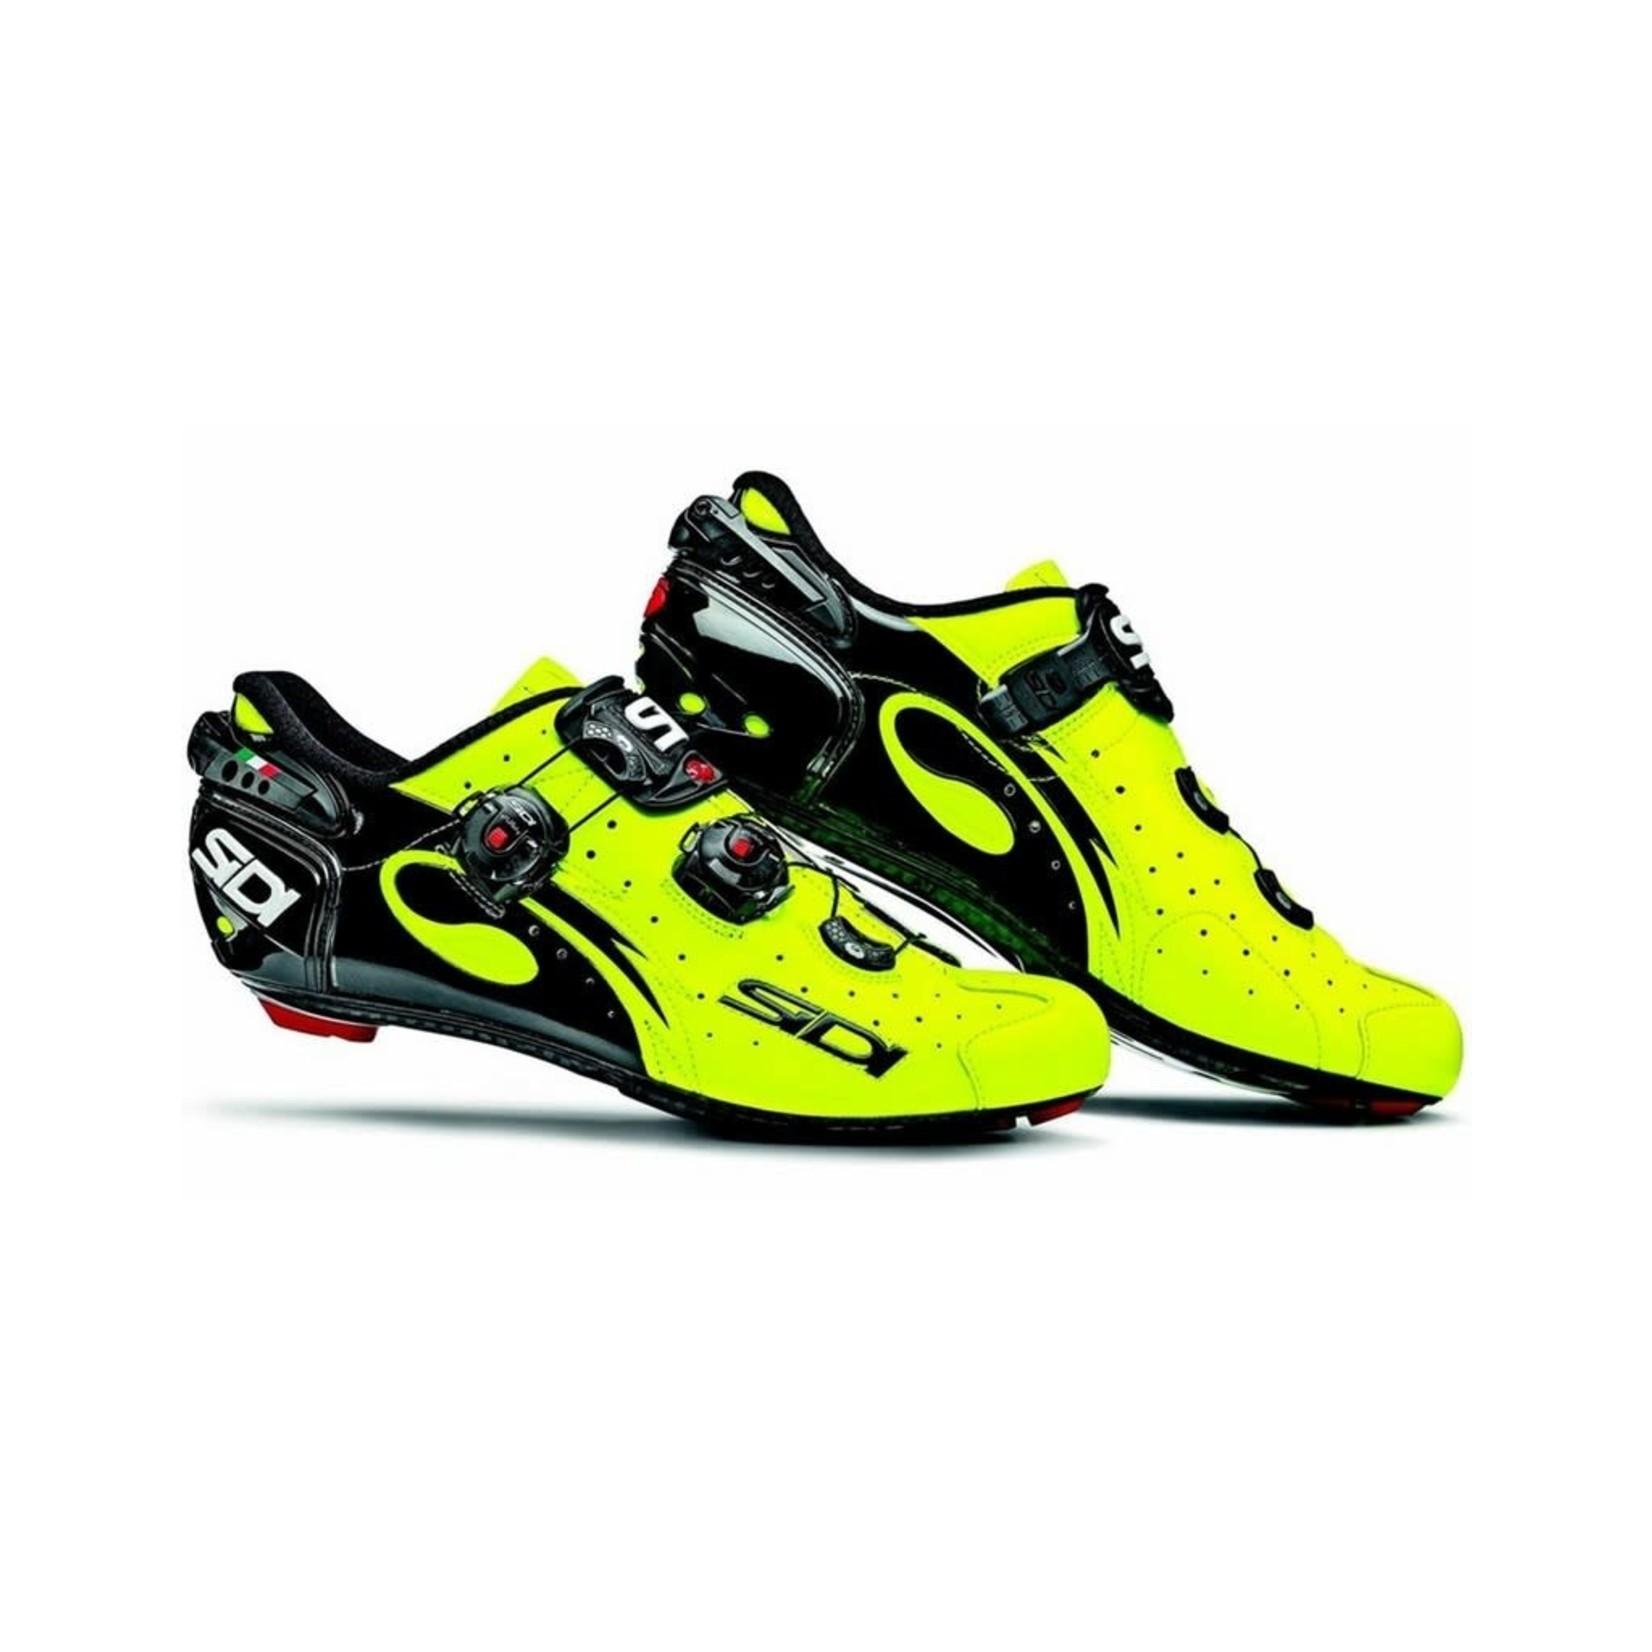 Sidi Shoes Sidi Wire Vent Carbon Yellow Fluo / Black